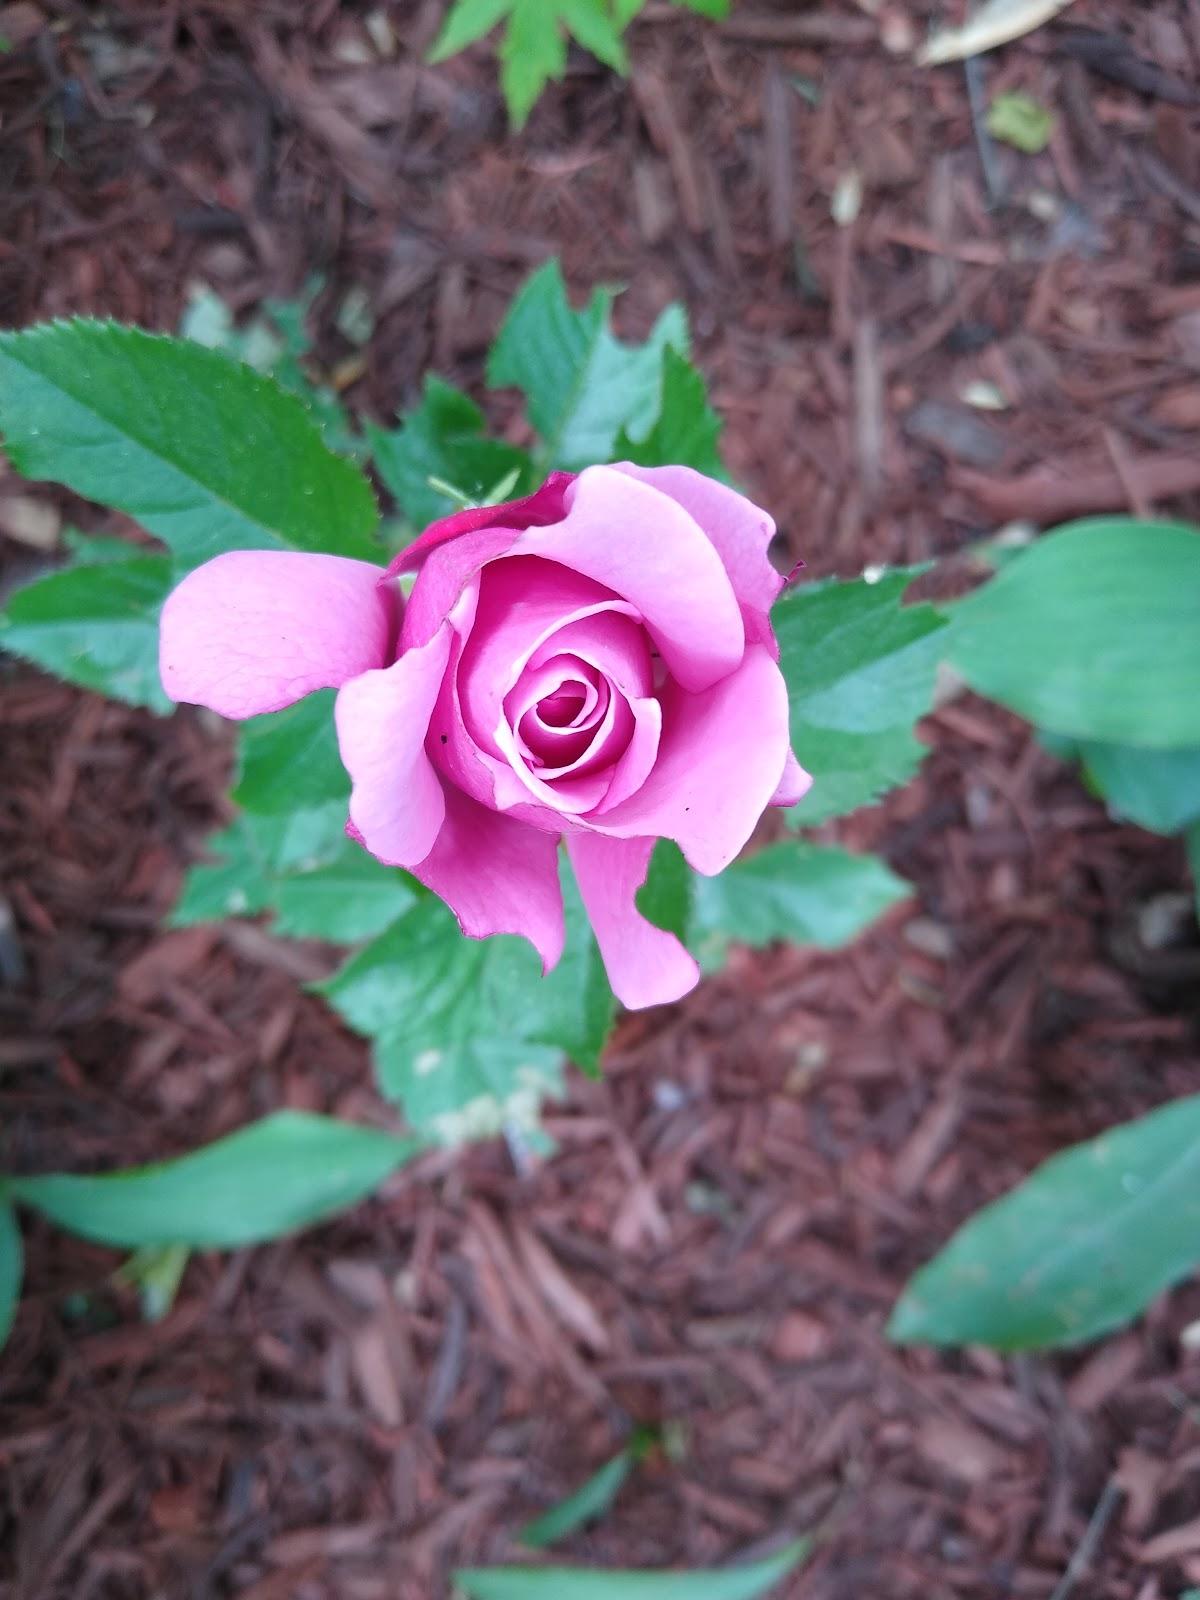 Barbra Streisand rose picture